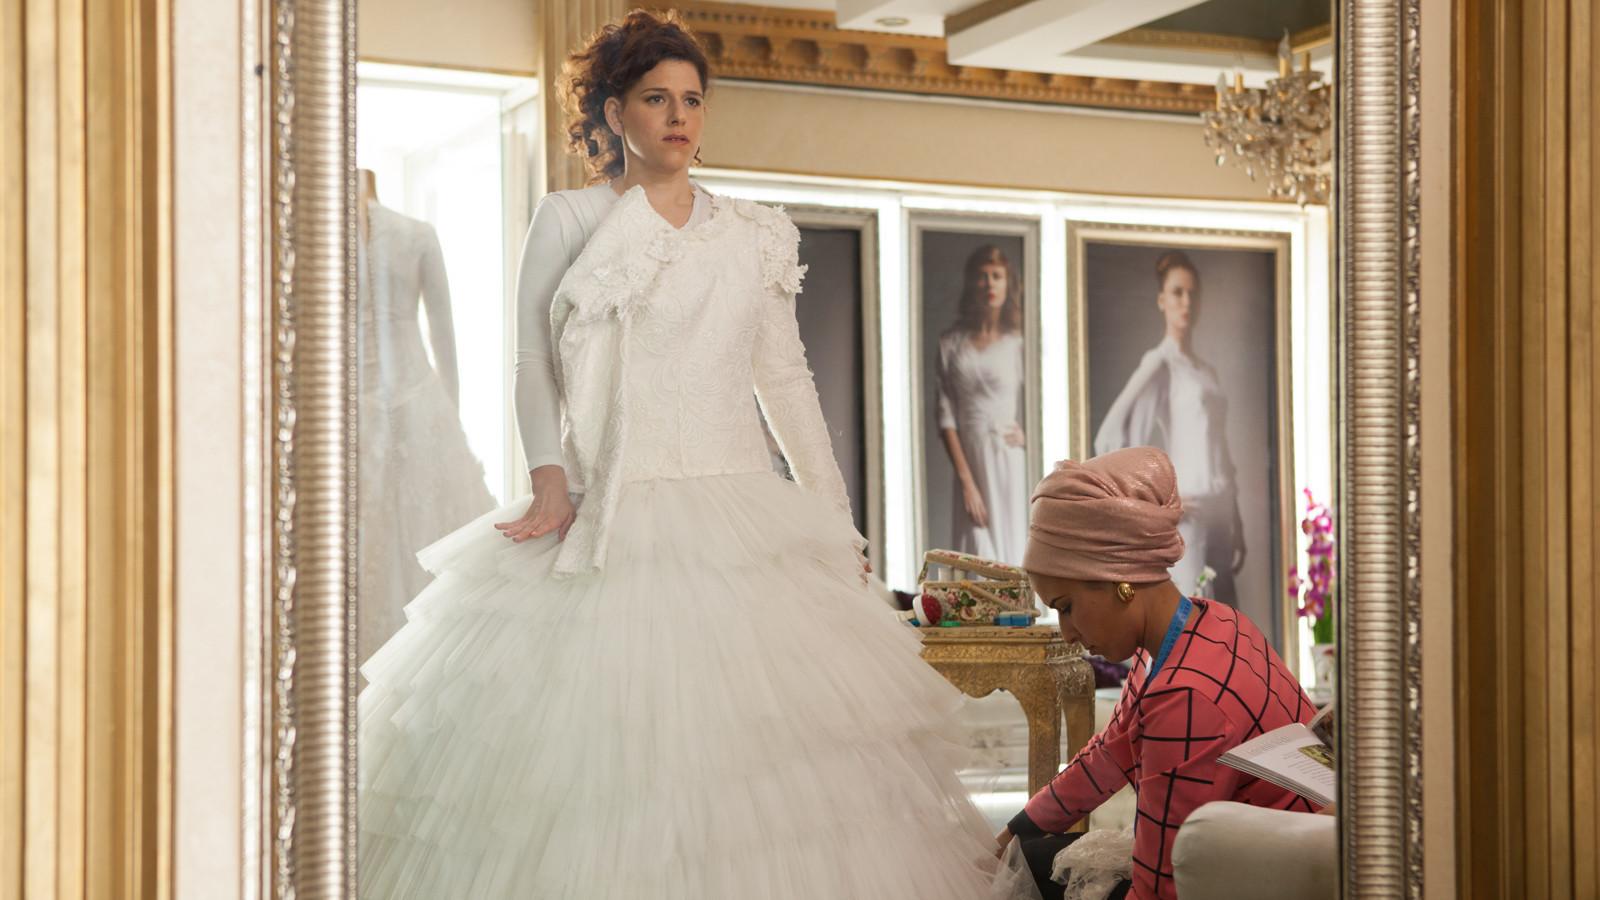 israeli film the wedding plan idiosyncratic and